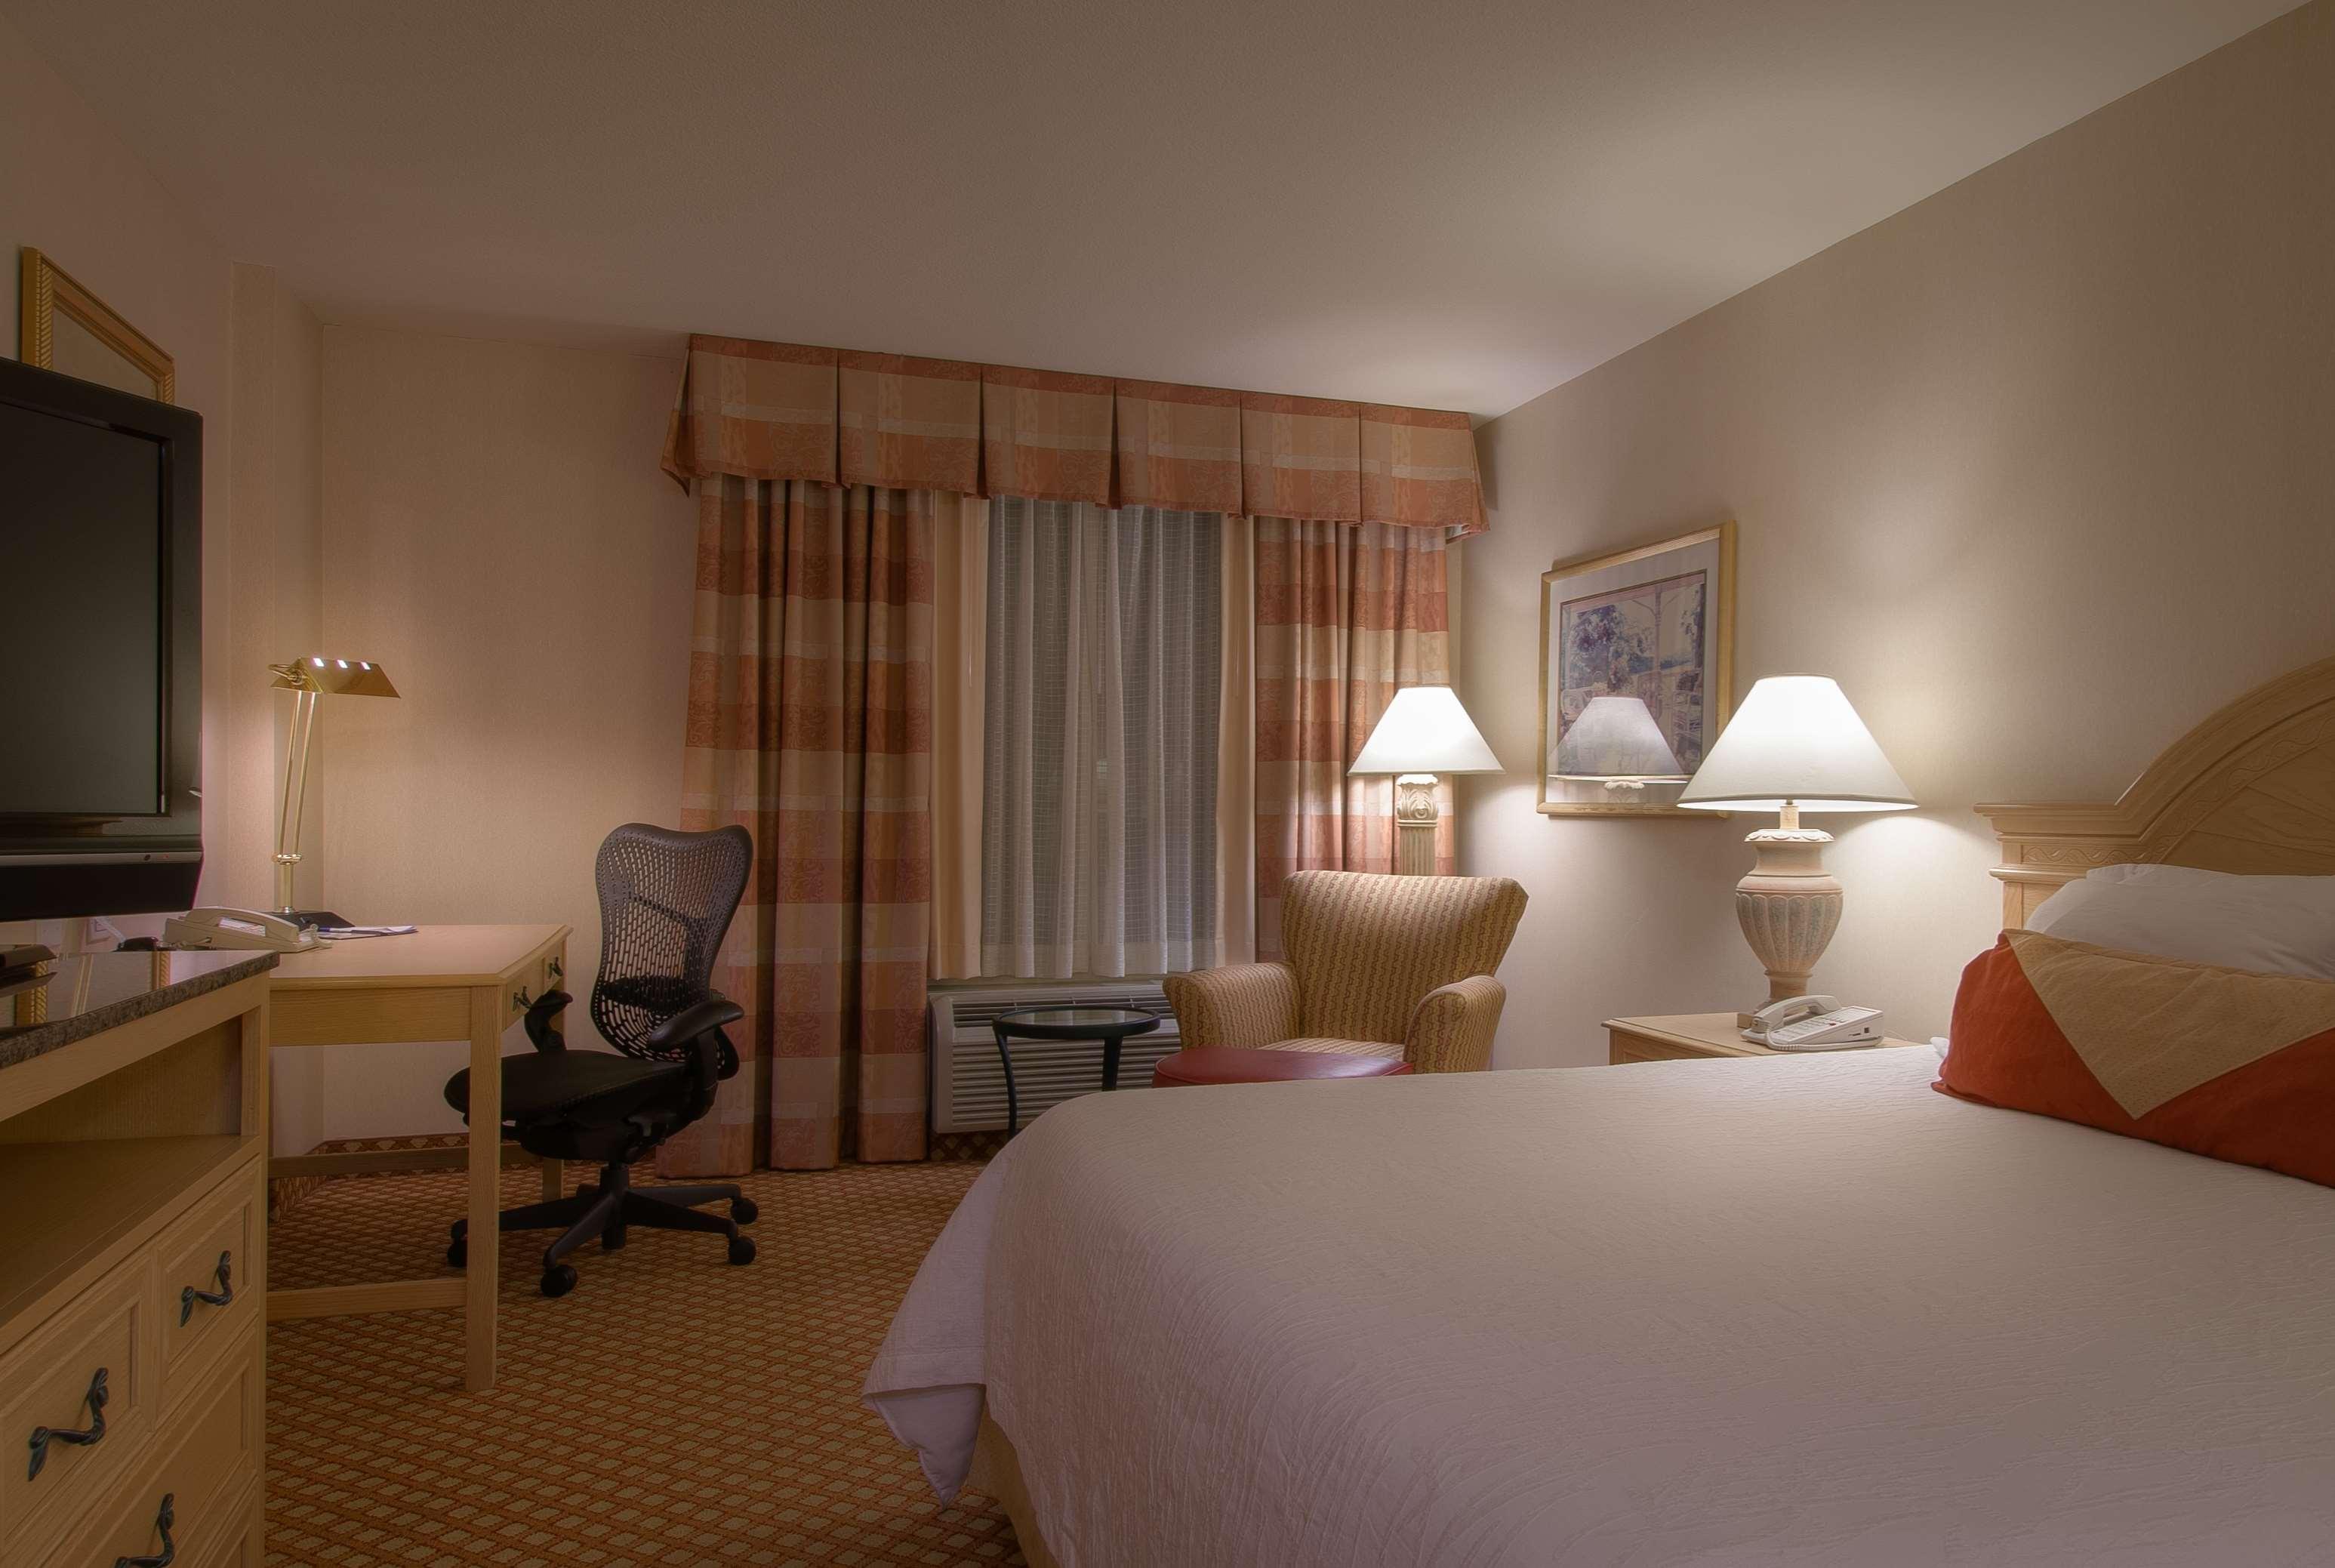 Hilton Garden Inn Mountain View image 4